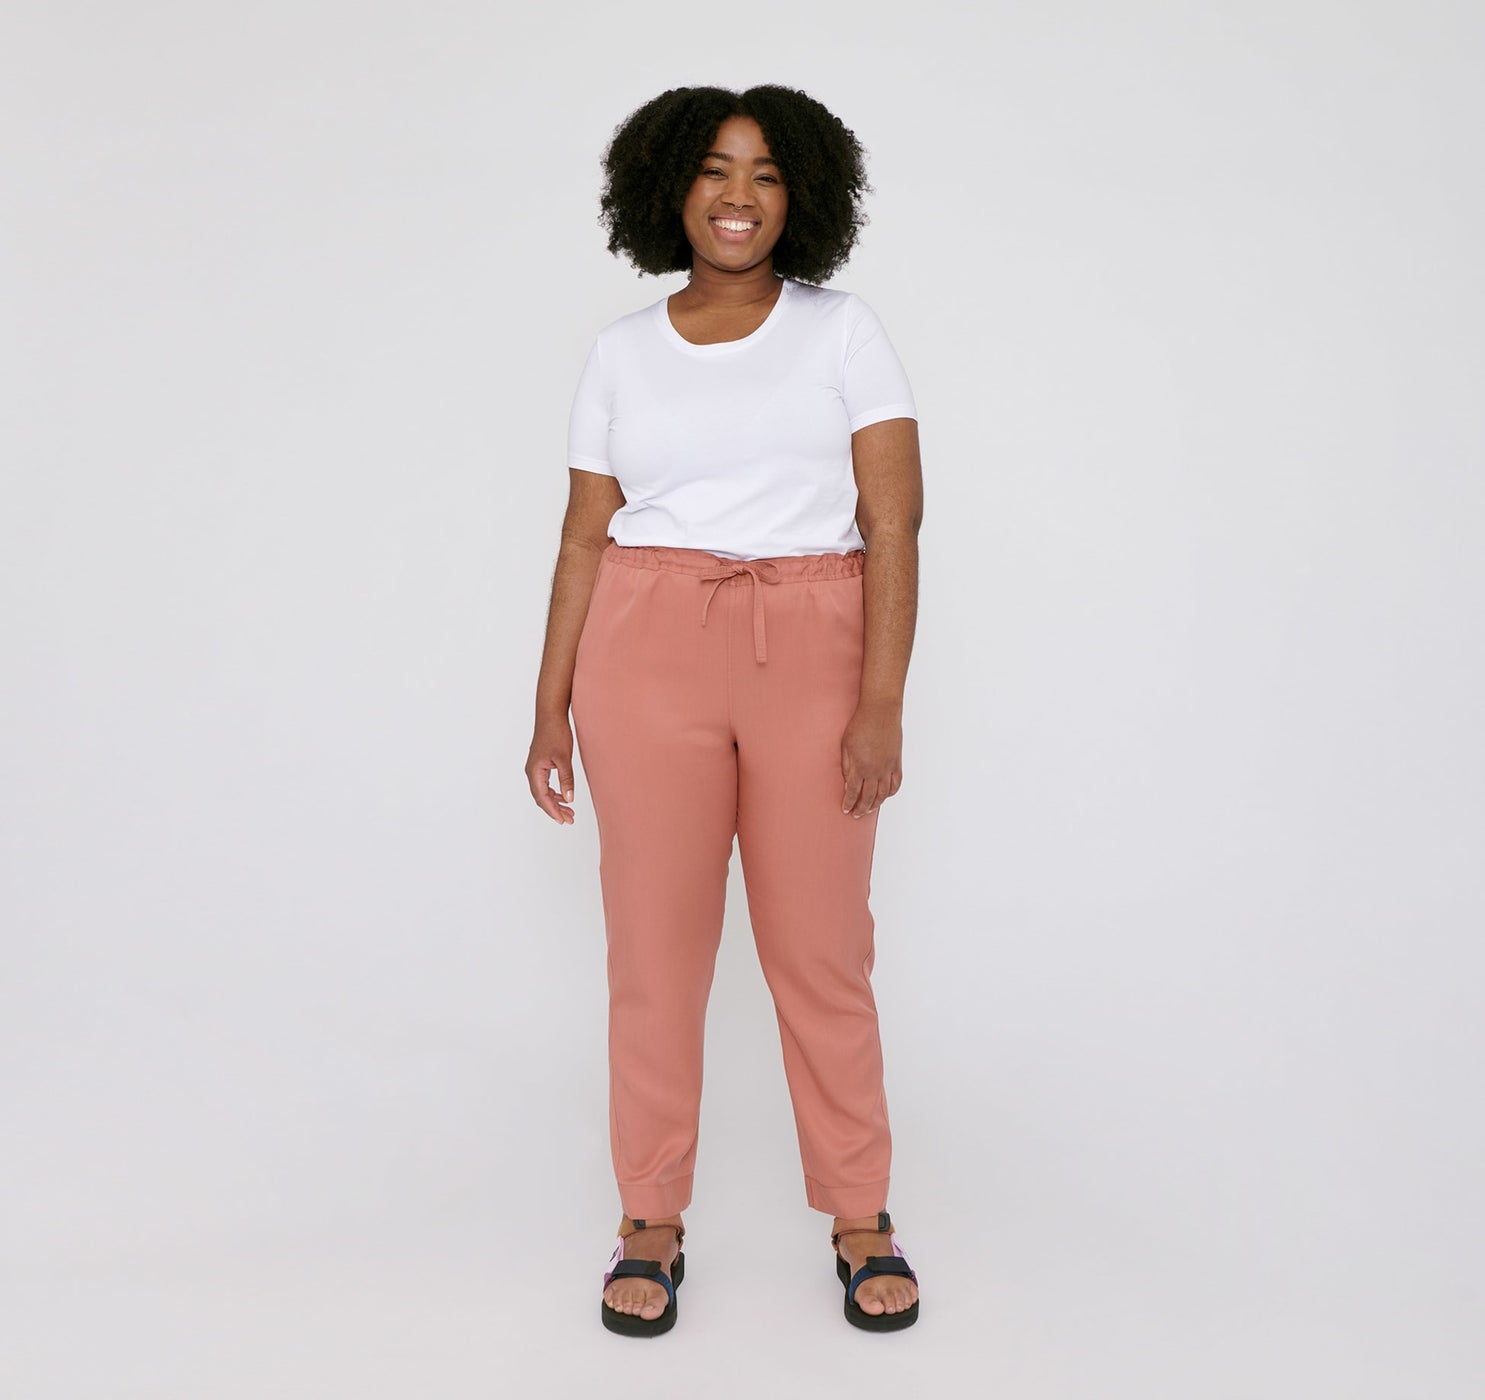 Organic Basics TENCEL™ Woven Draw-Cord Pants